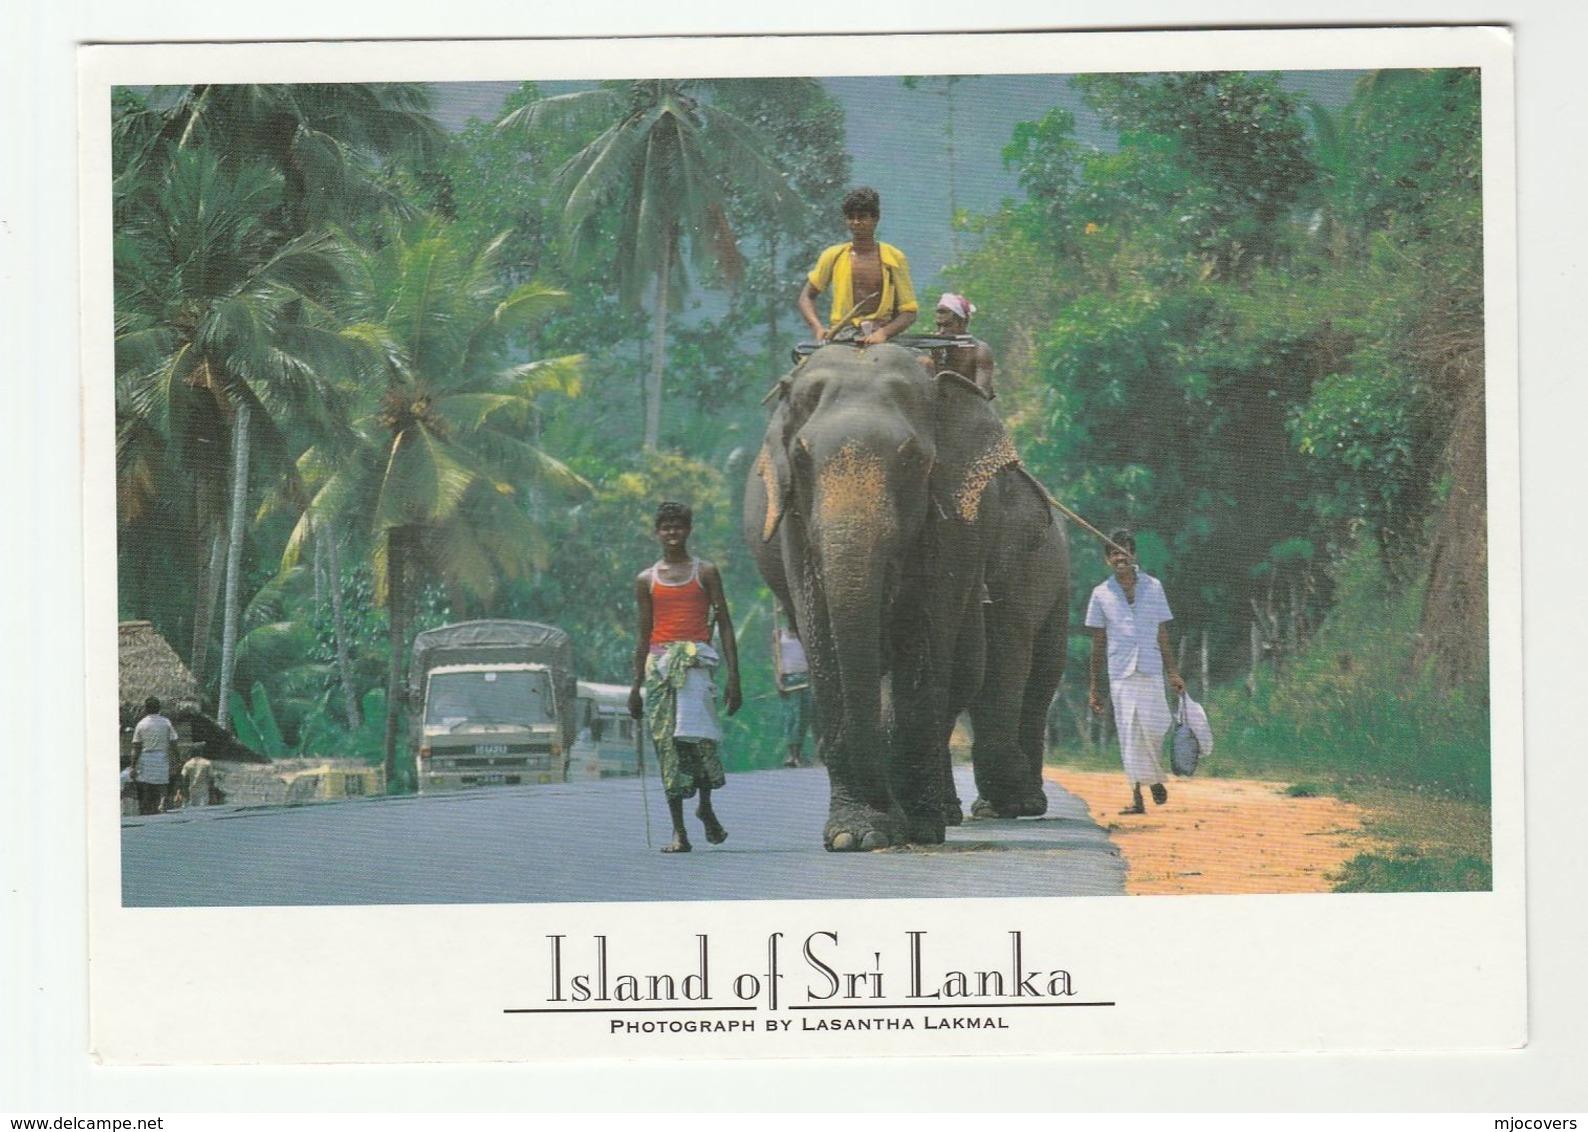 2015 SRI LANKA COVER Stamps JUPITER Planet (postcard ELEPHANT) Space Astronomy - Astronomy